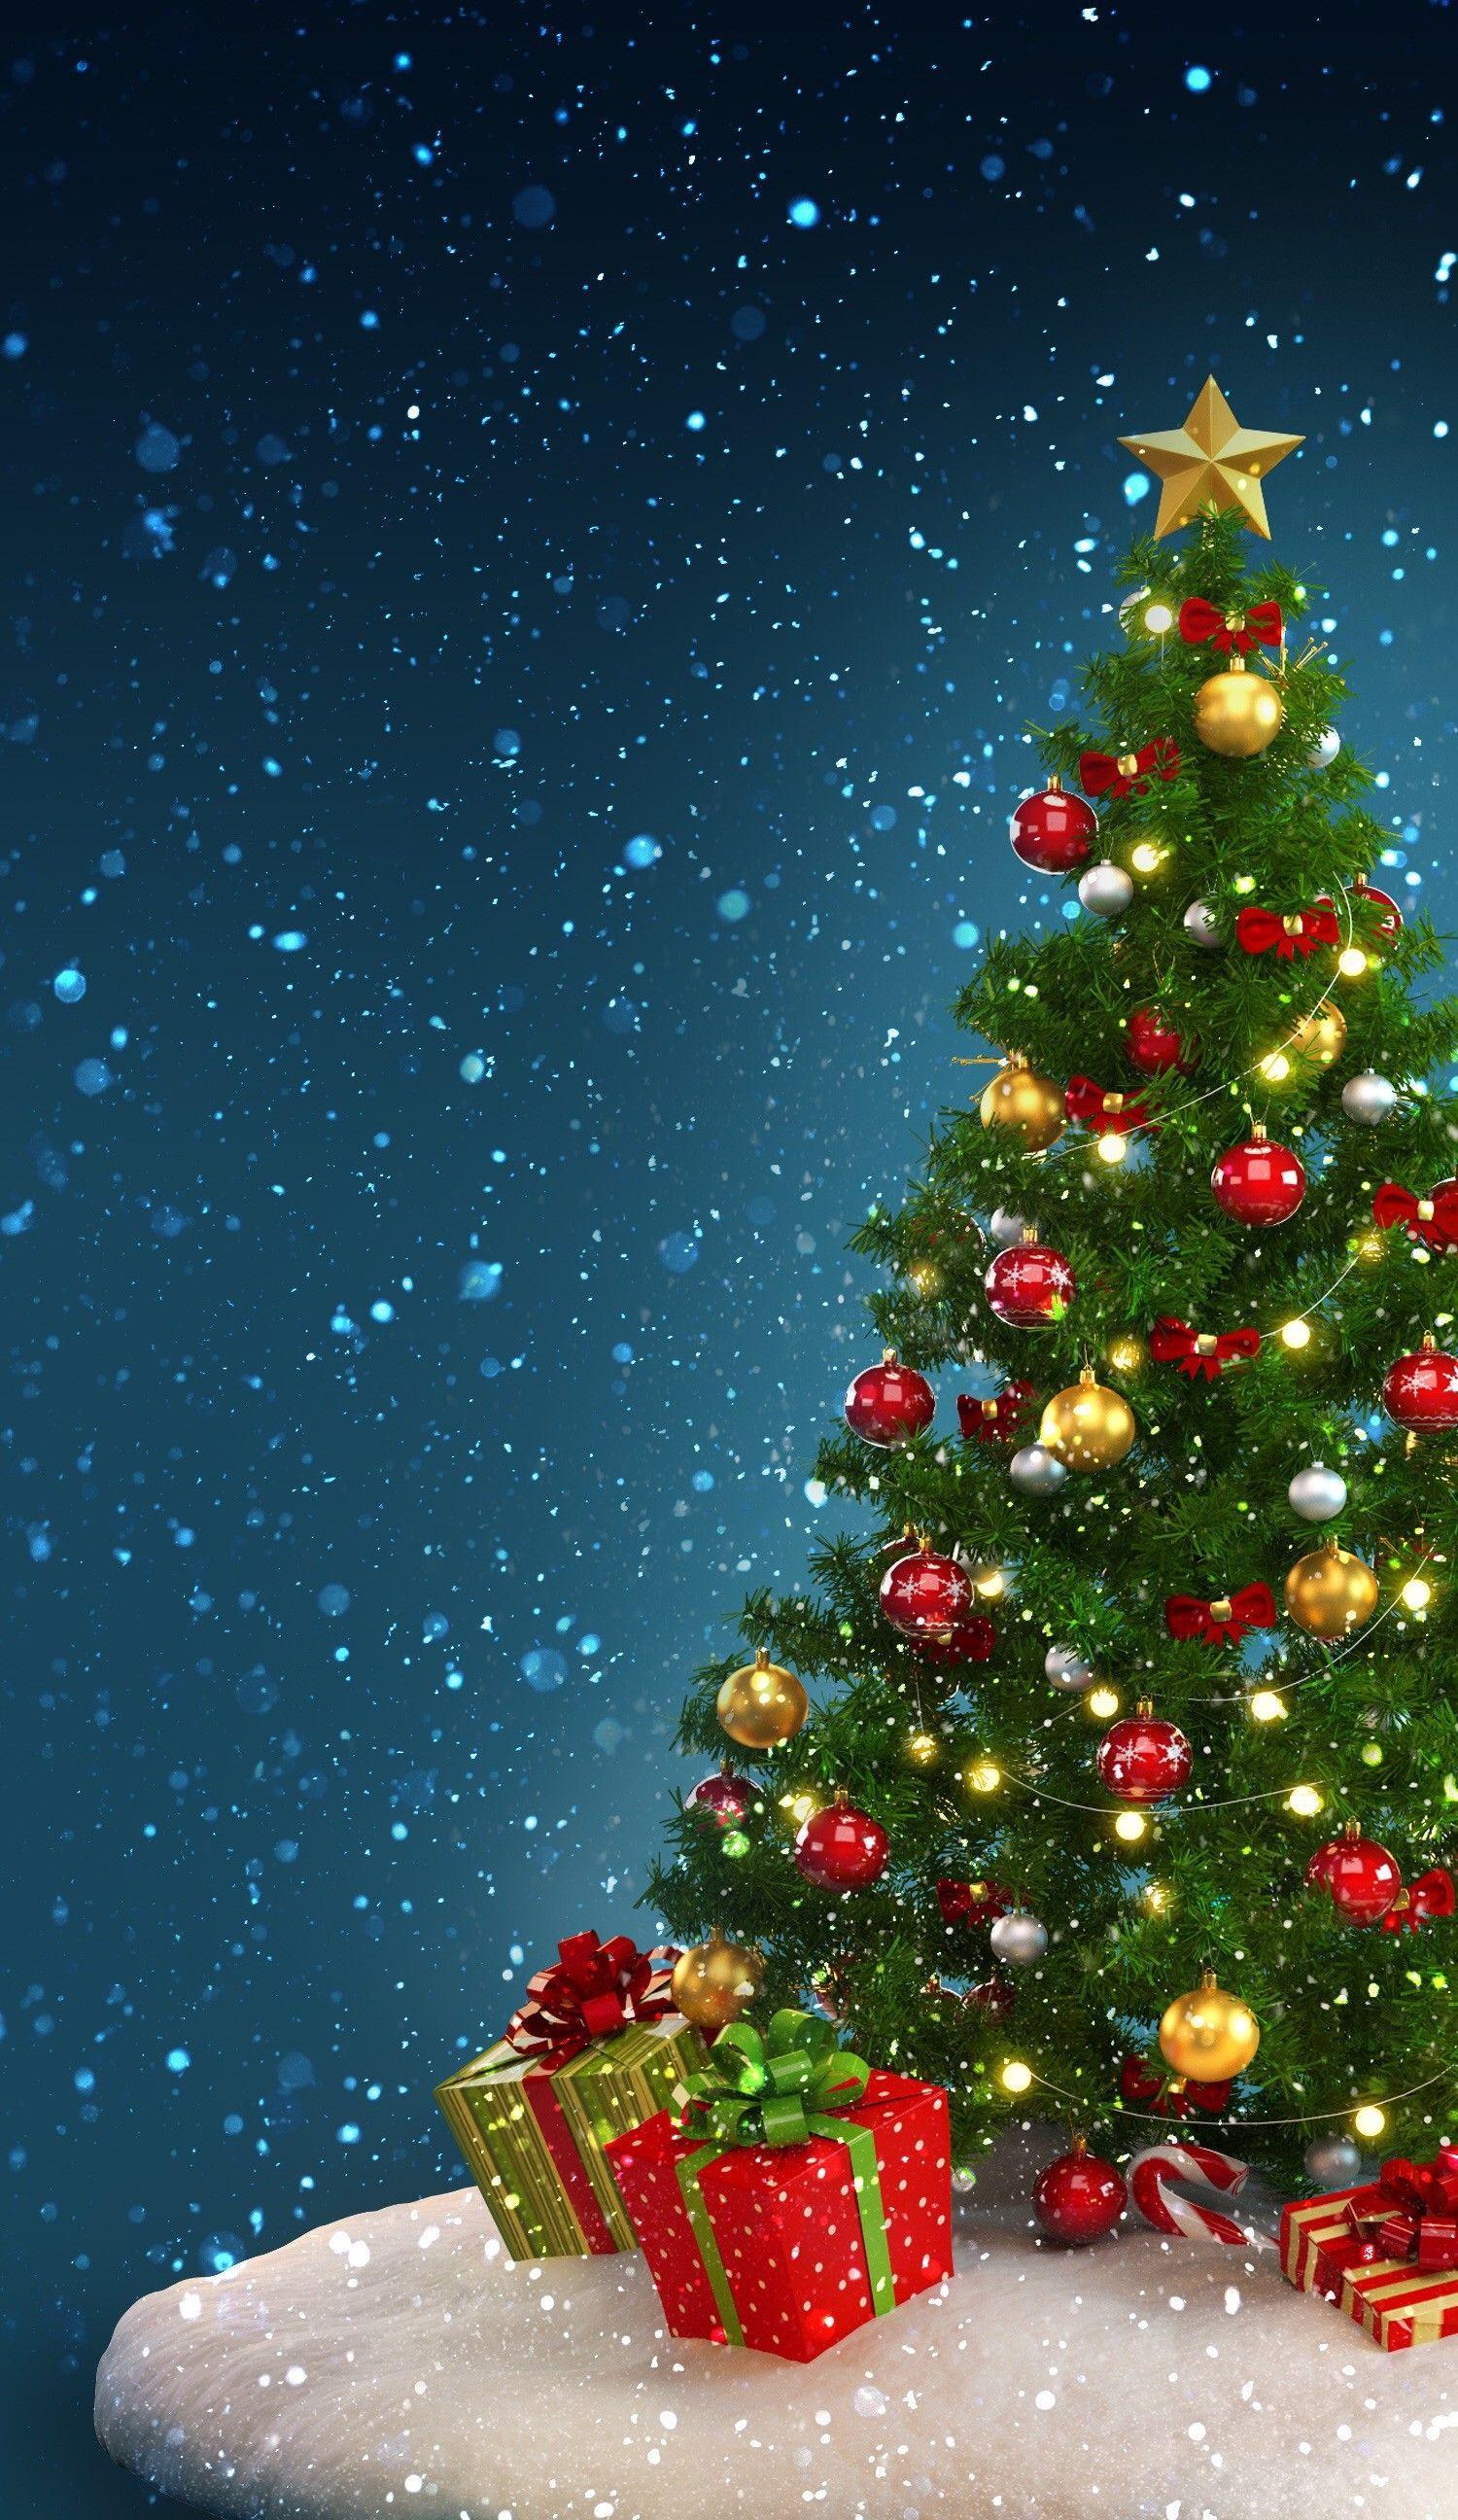 Christmas Tree Phone Wallpapers Top Free Christmas Tree Phone Backgrounds Wallpaperaccess